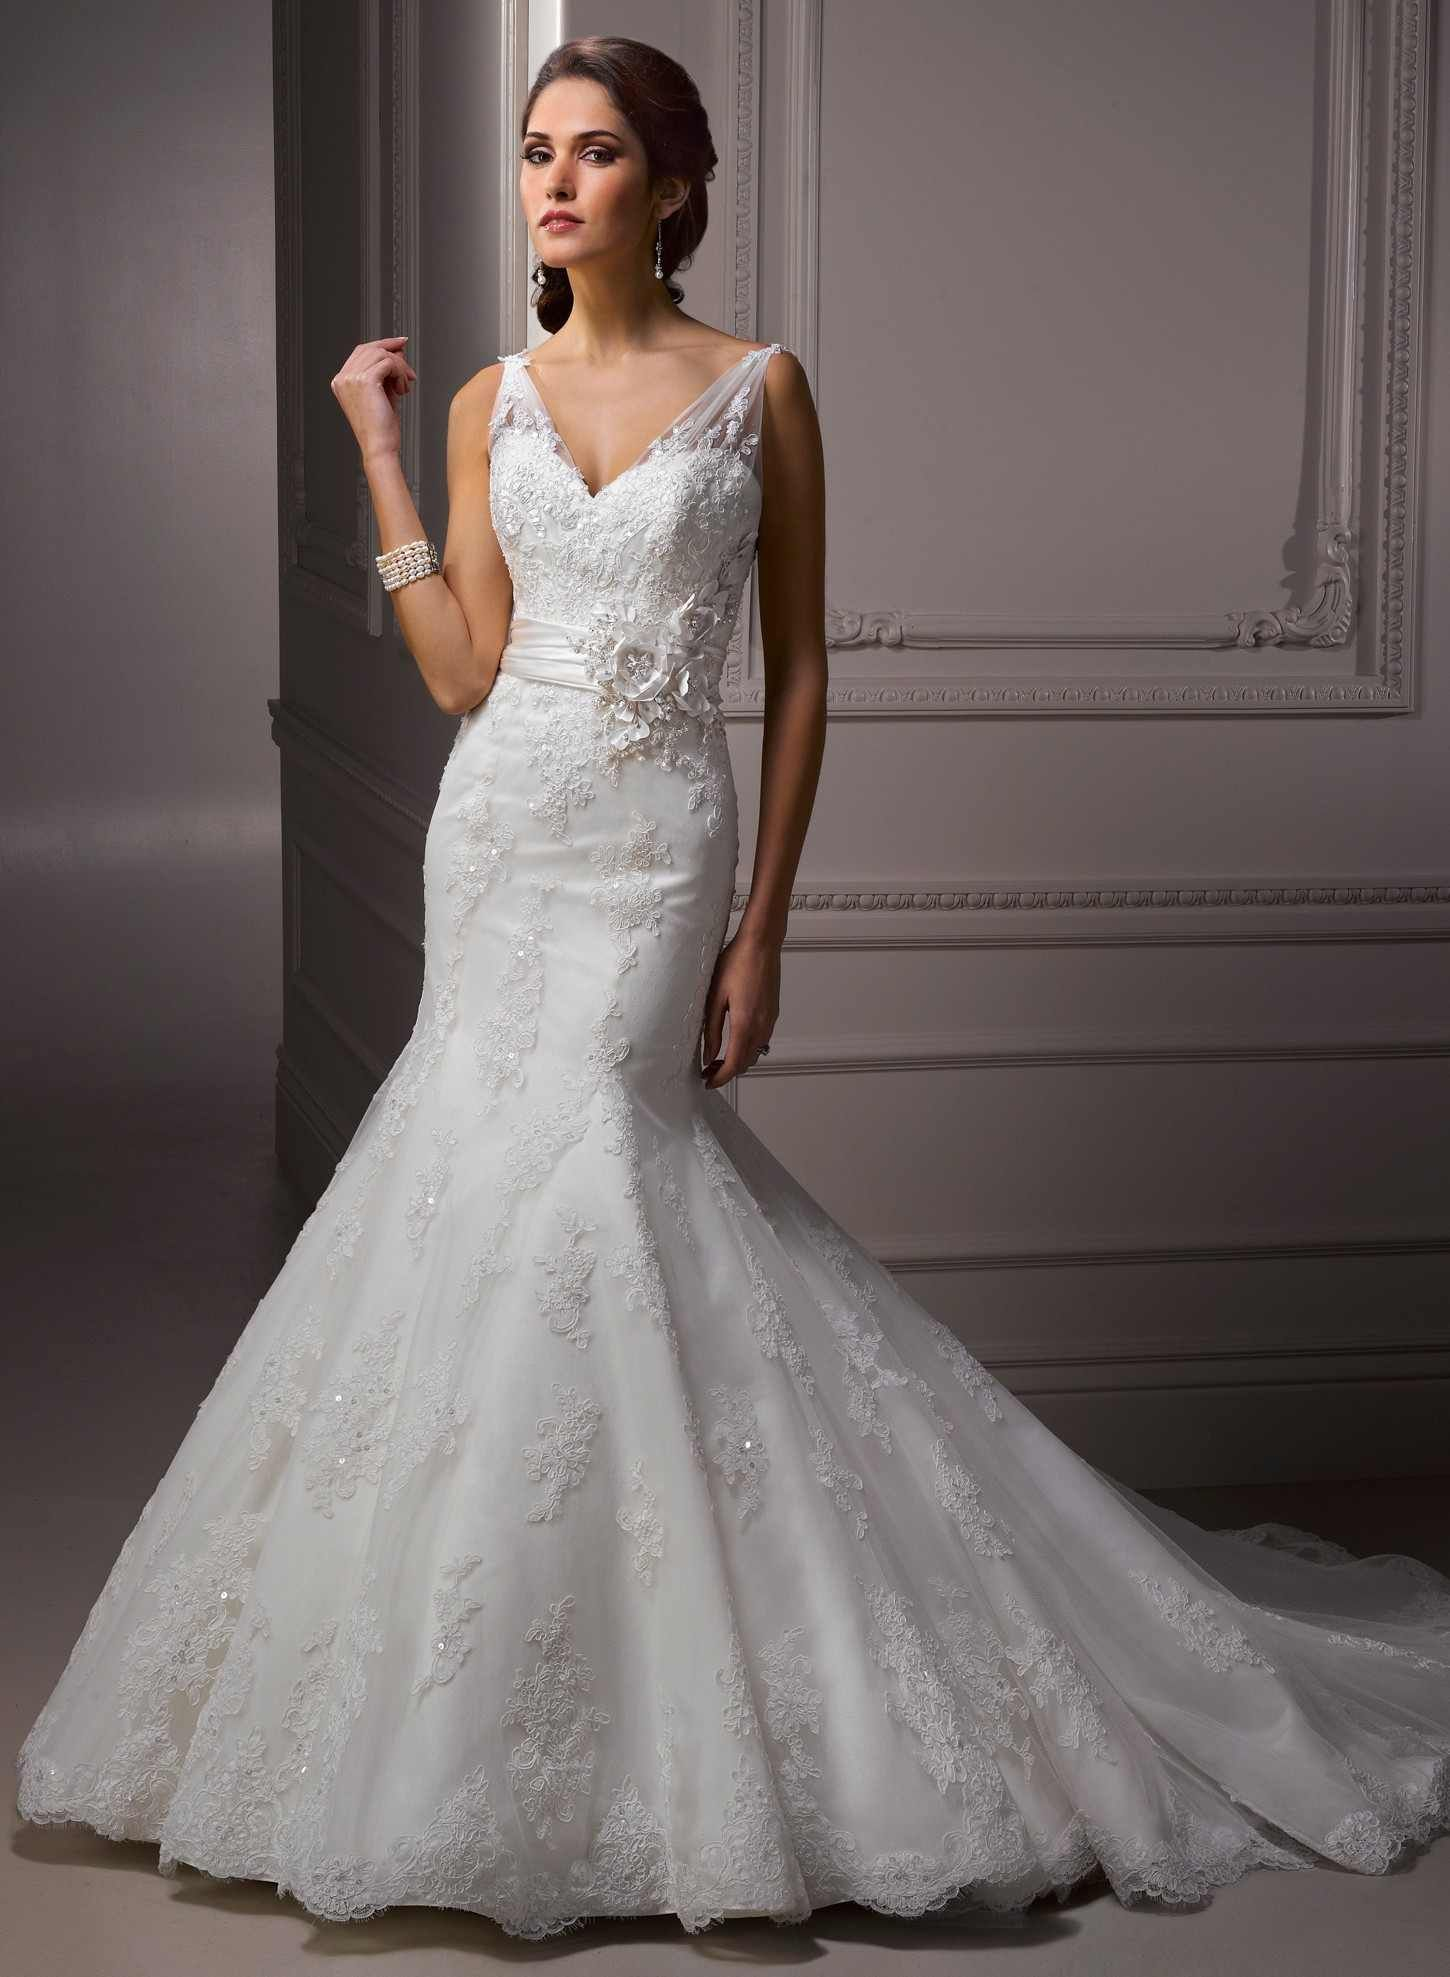 Mermaid dress wedding  Wedding dress  Alexus wedding  Pinterest  Lace mermaid dresses